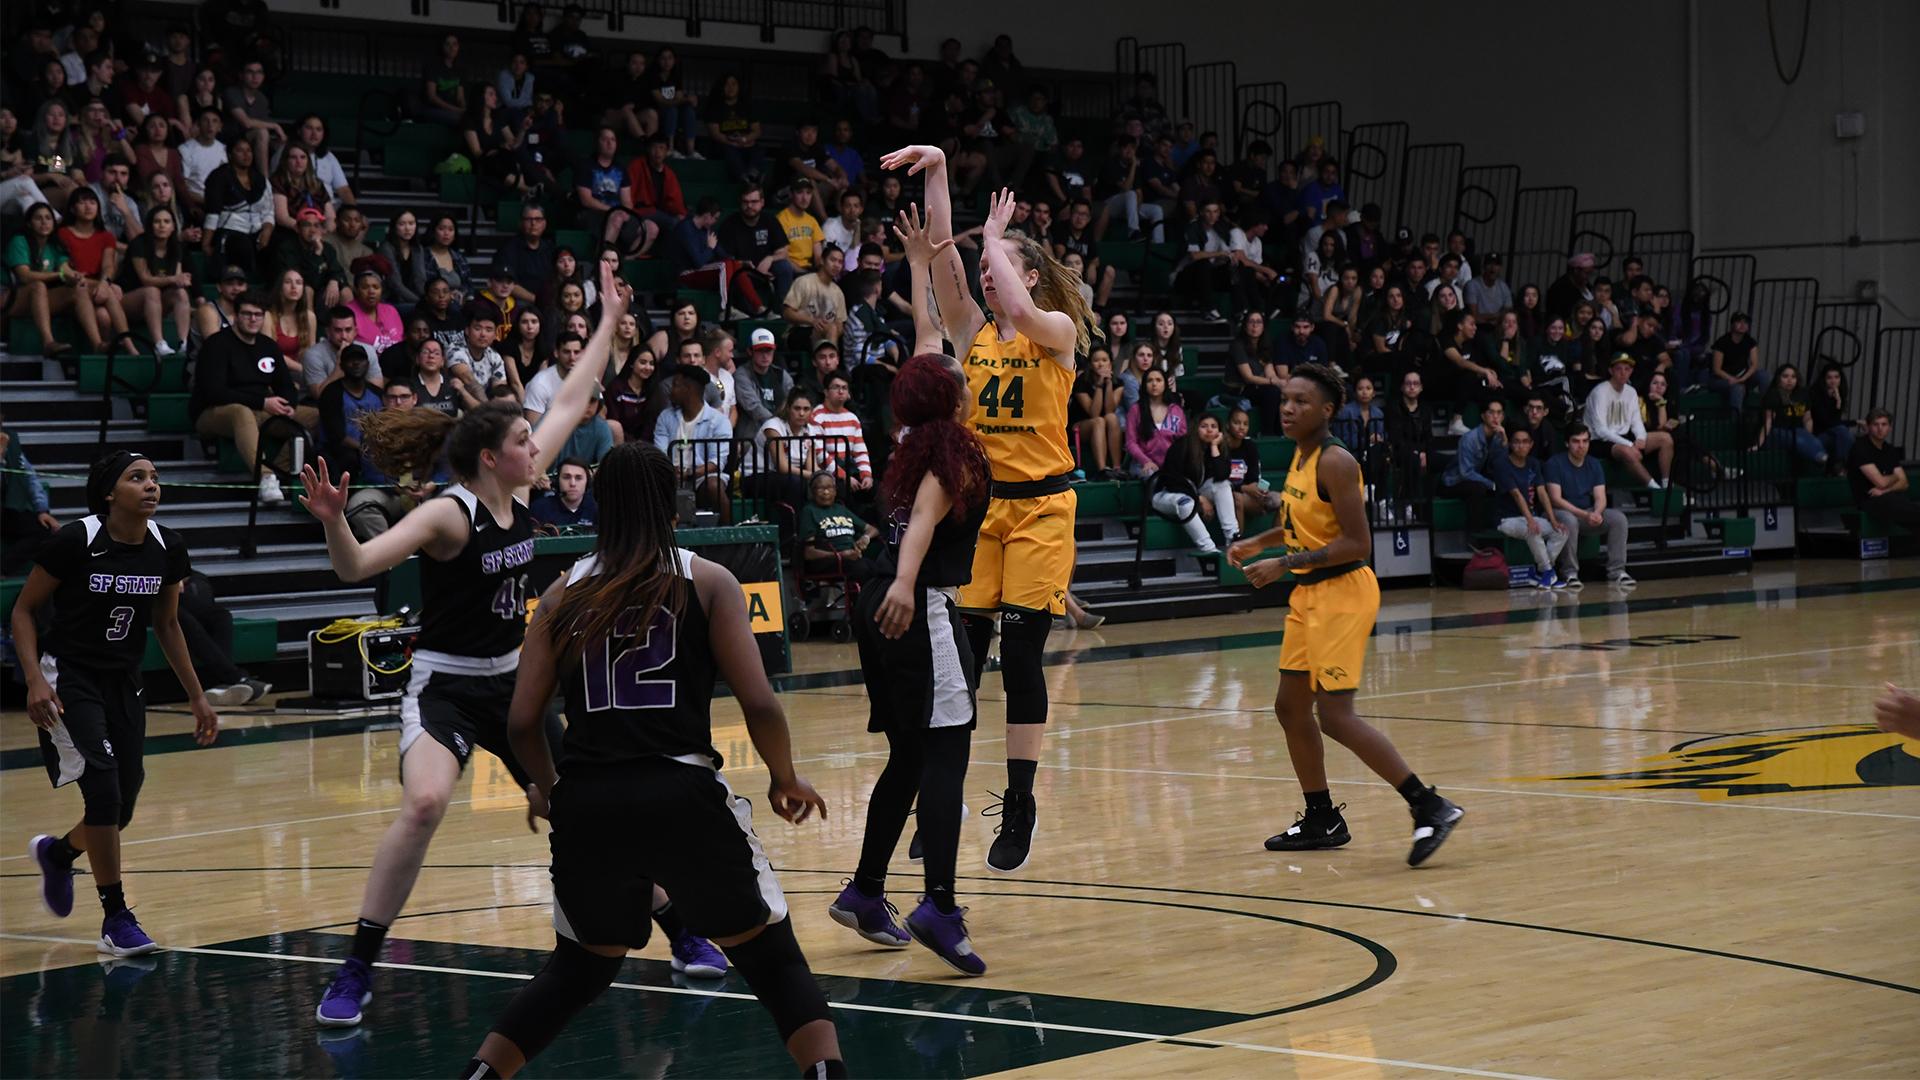 Kasey Smit - 2018 19 - Women'S Basketball - Cal Poly Intended For Cal Poly Pomona Academic Calendar 2021 20